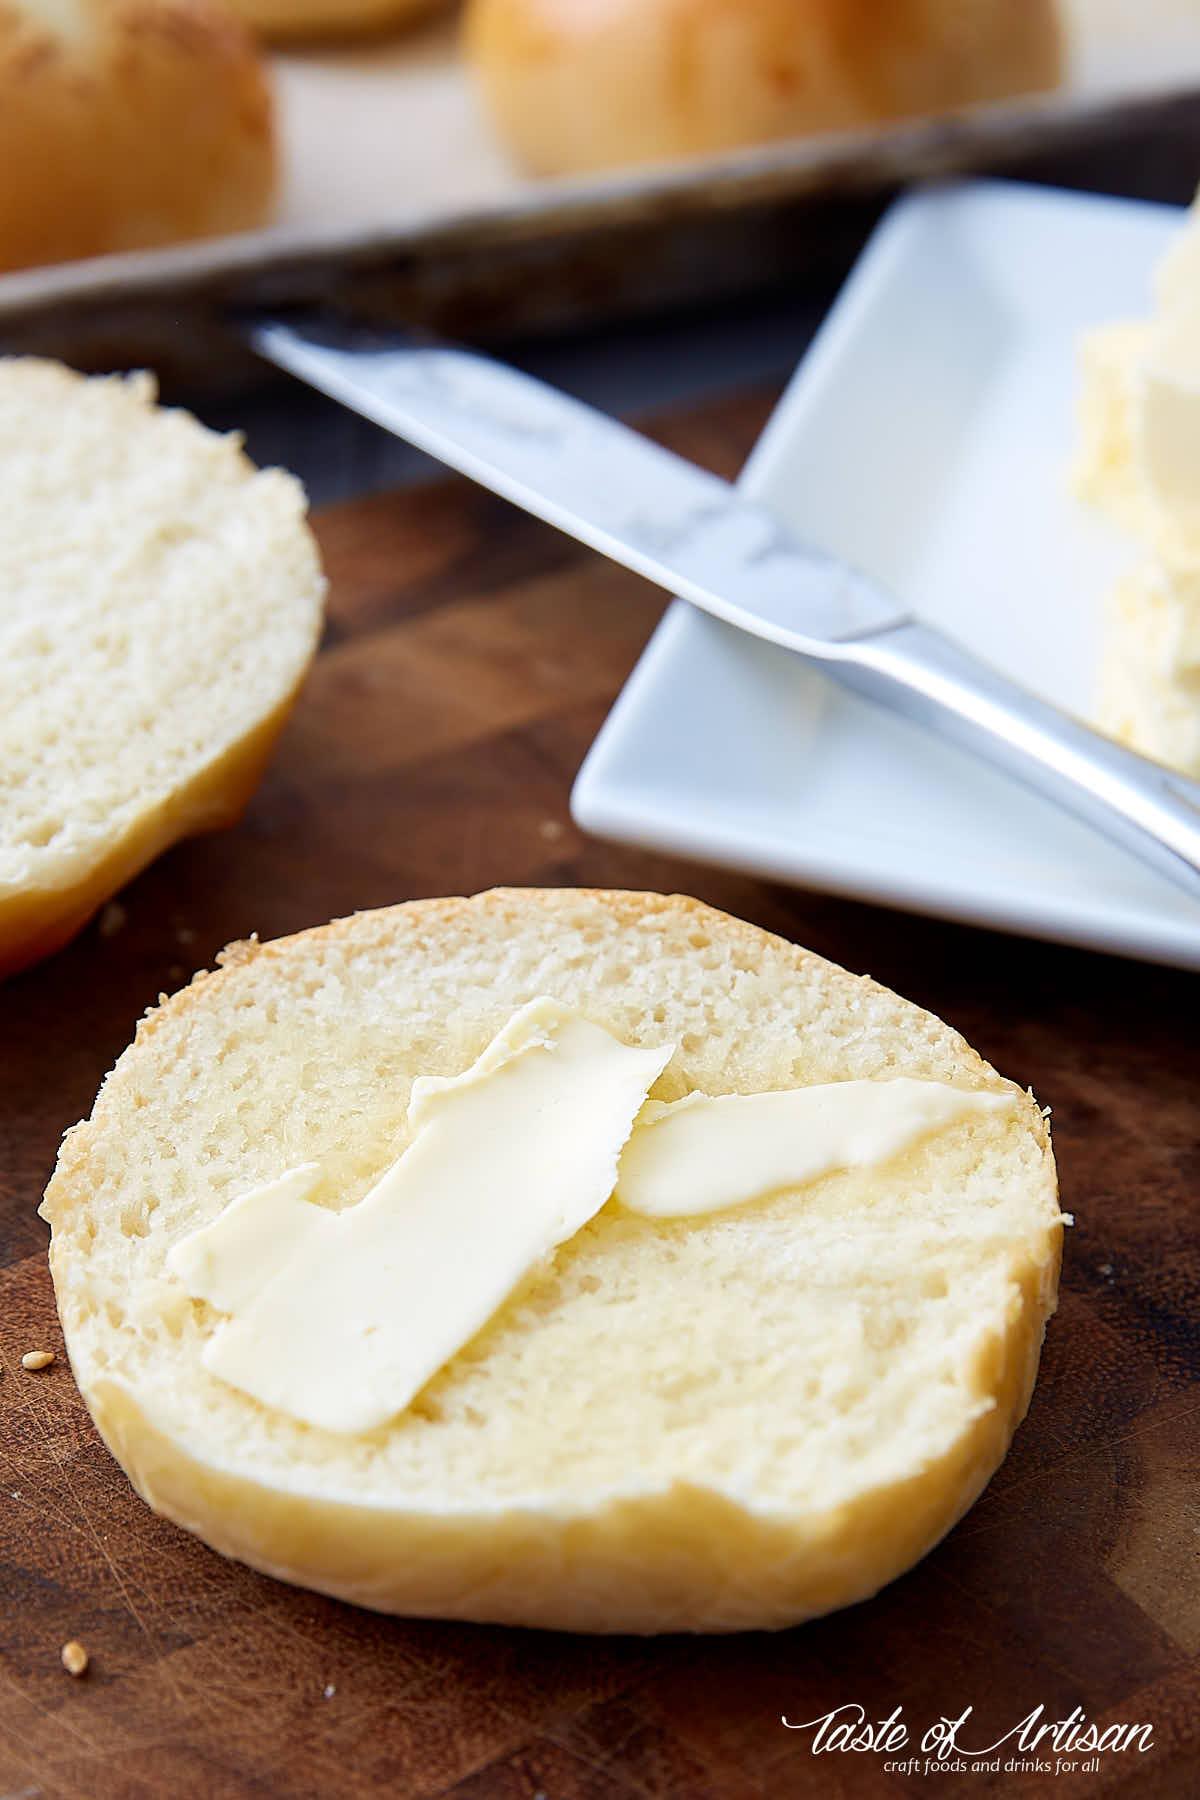 A cut in half brioche bun with butter spread on top.